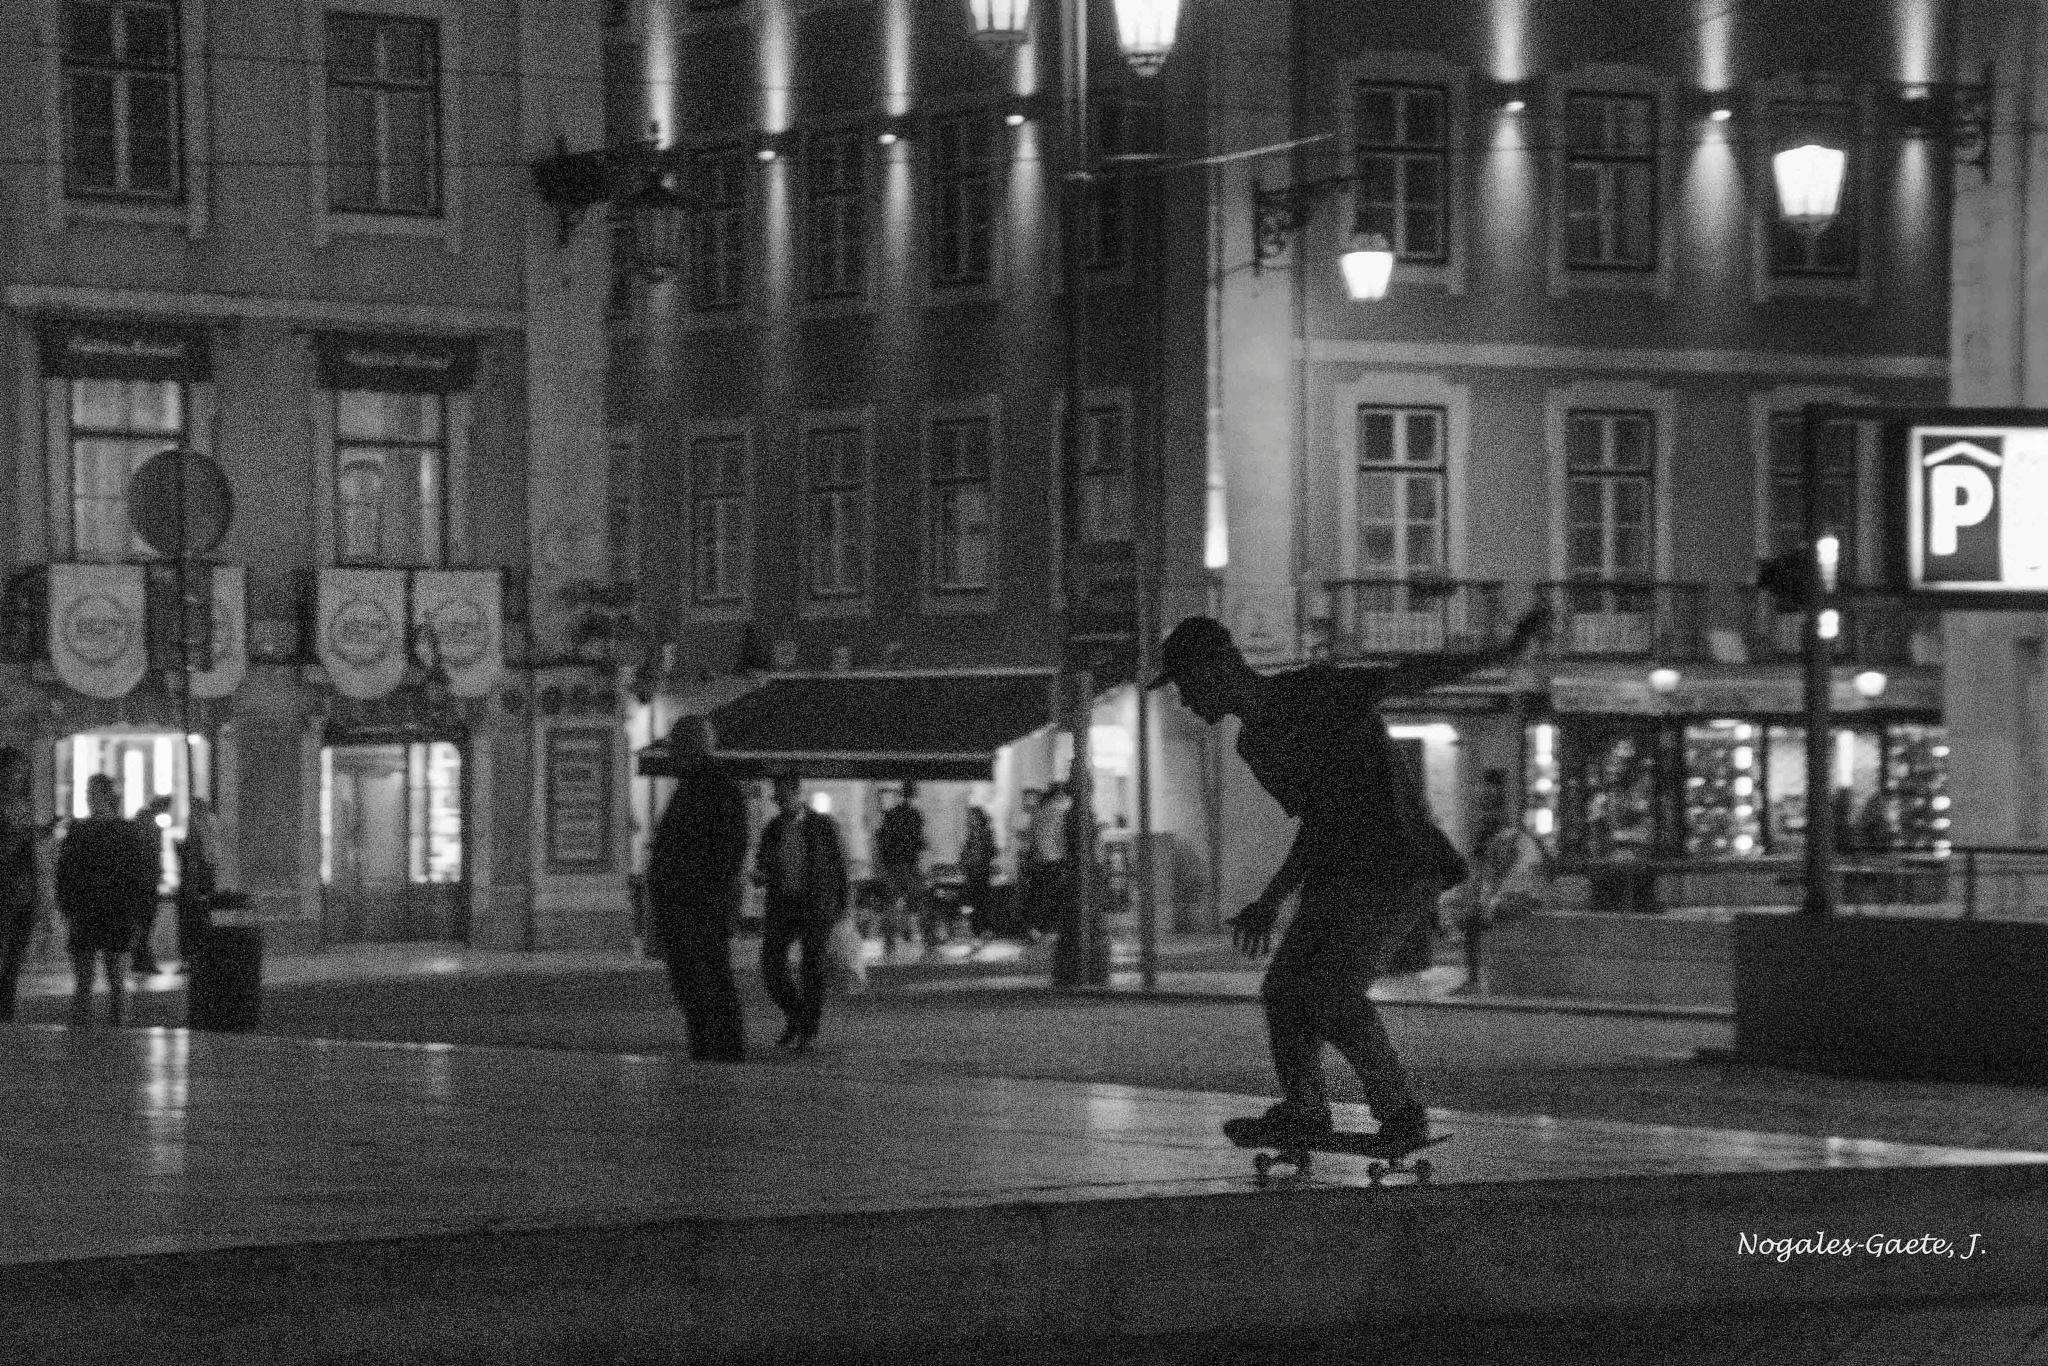 Skating silhouette by Jorge Nogales